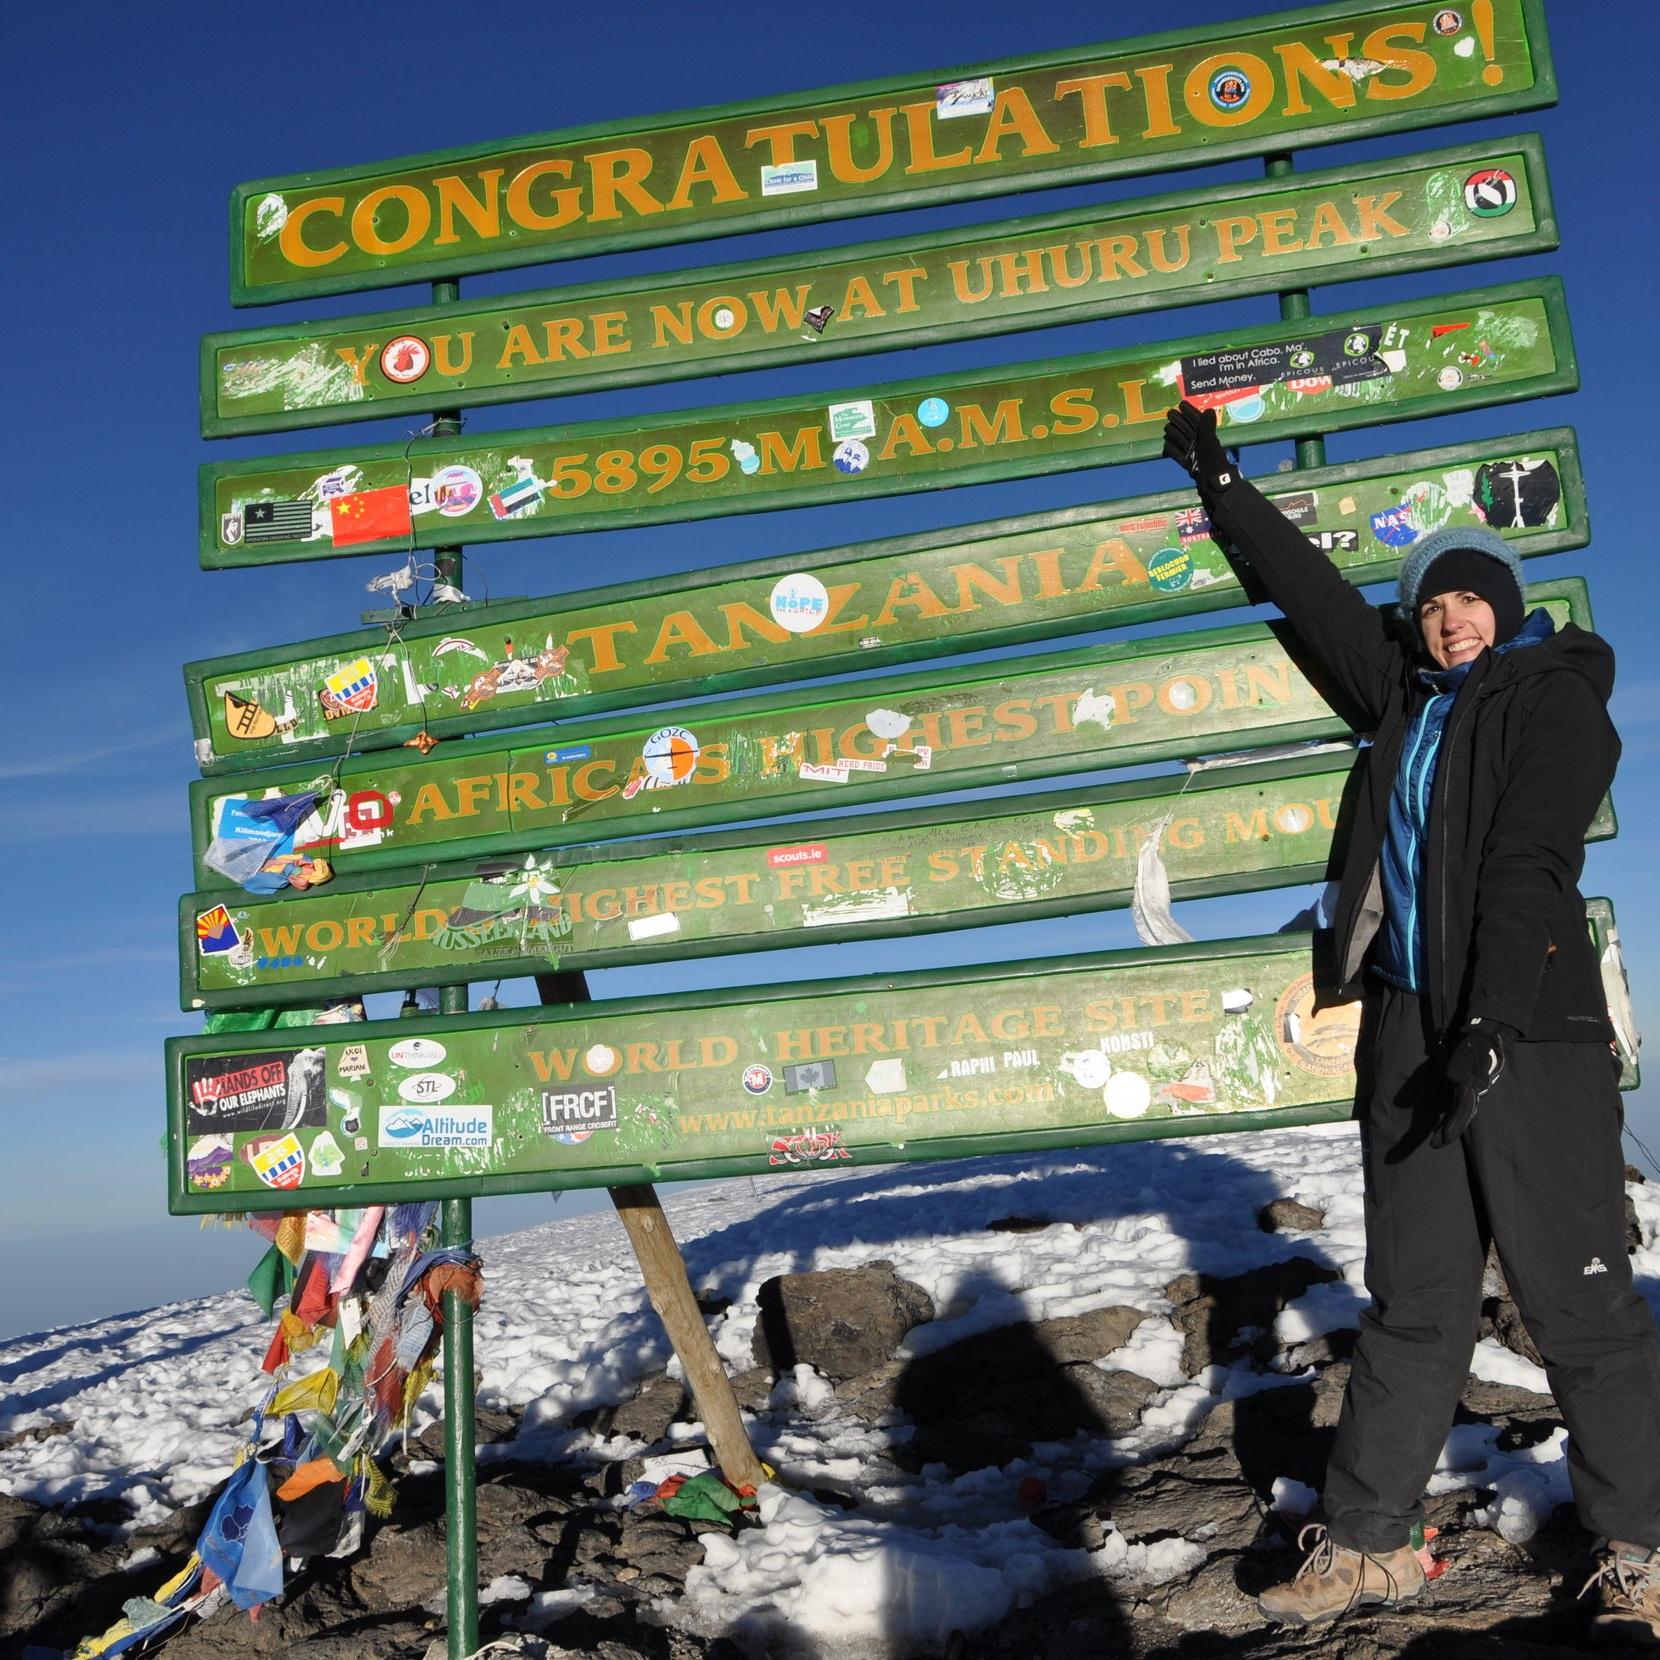 Summiting Kilimanjaro, 19,341 feet. January 2014.